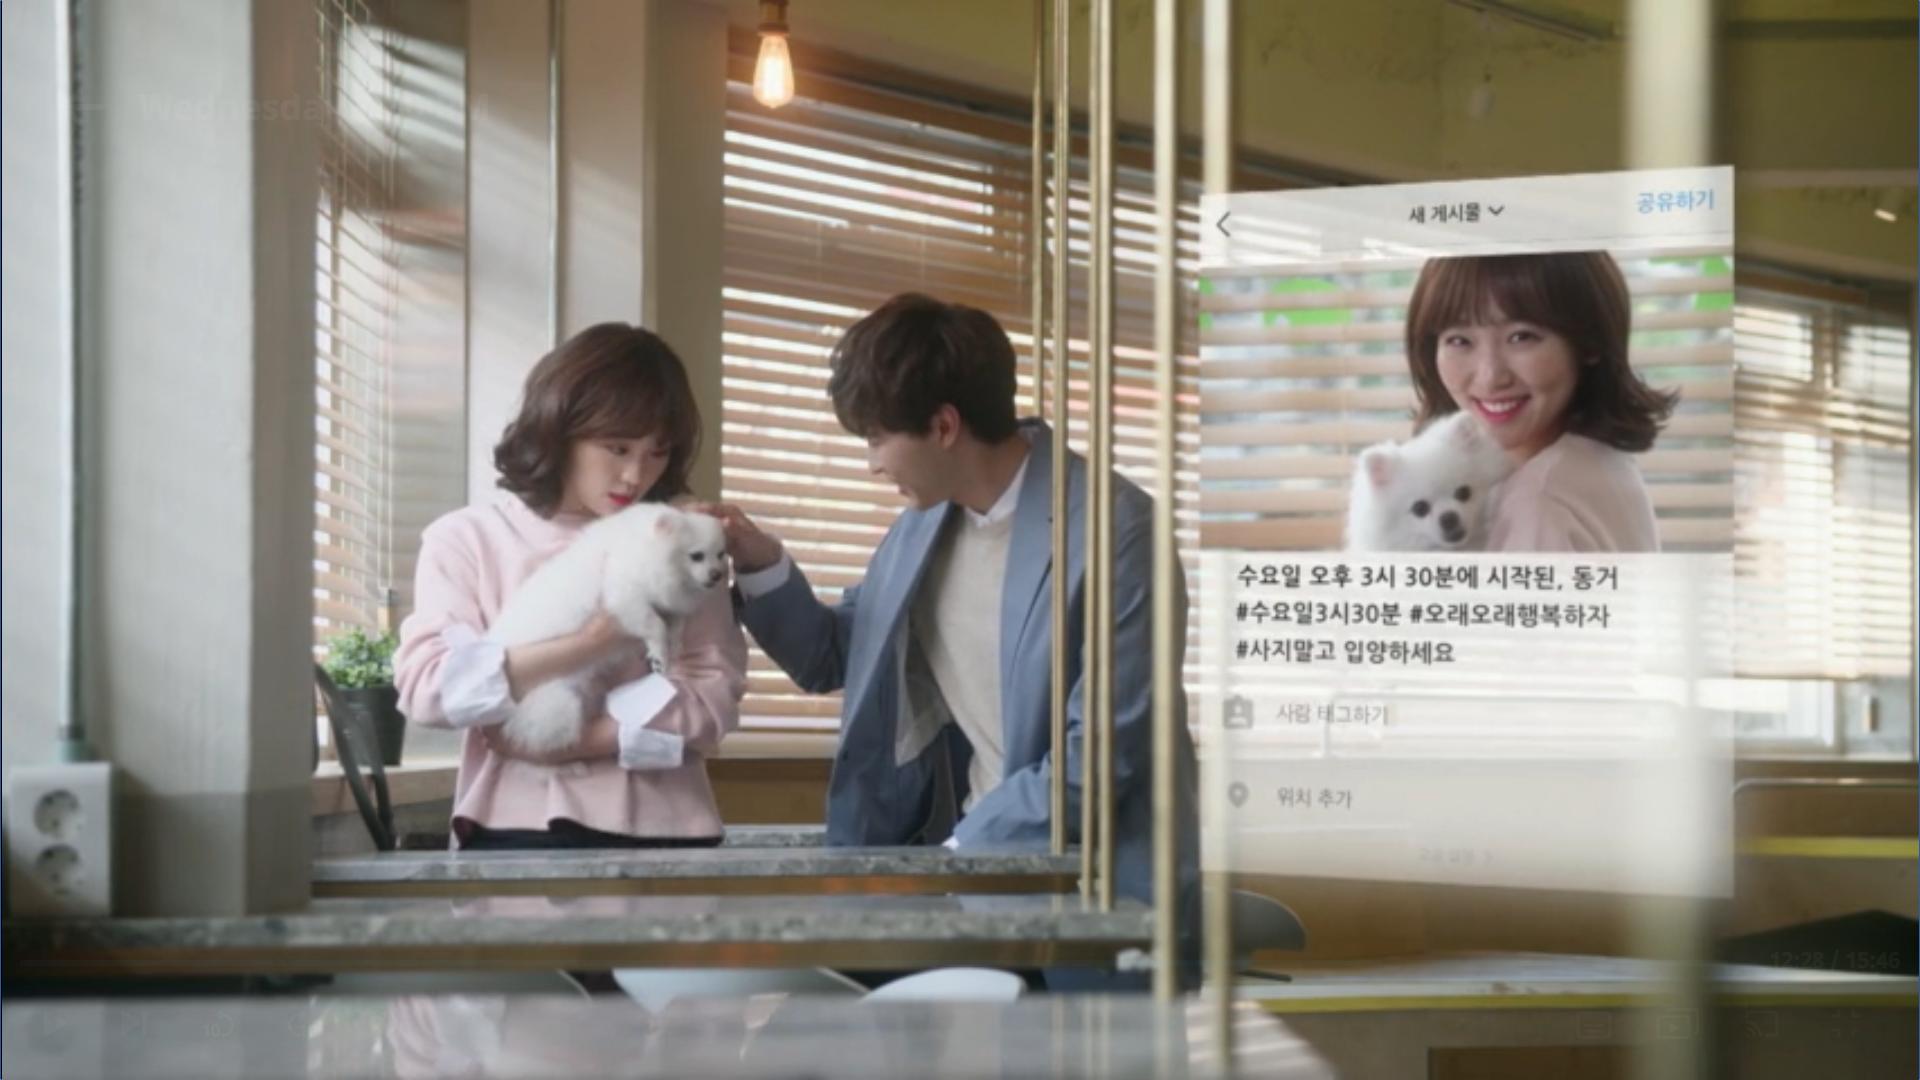 Wednesday 3:30 PM Yoon Jae-won and Seon Eun-woo holding dog Huchu